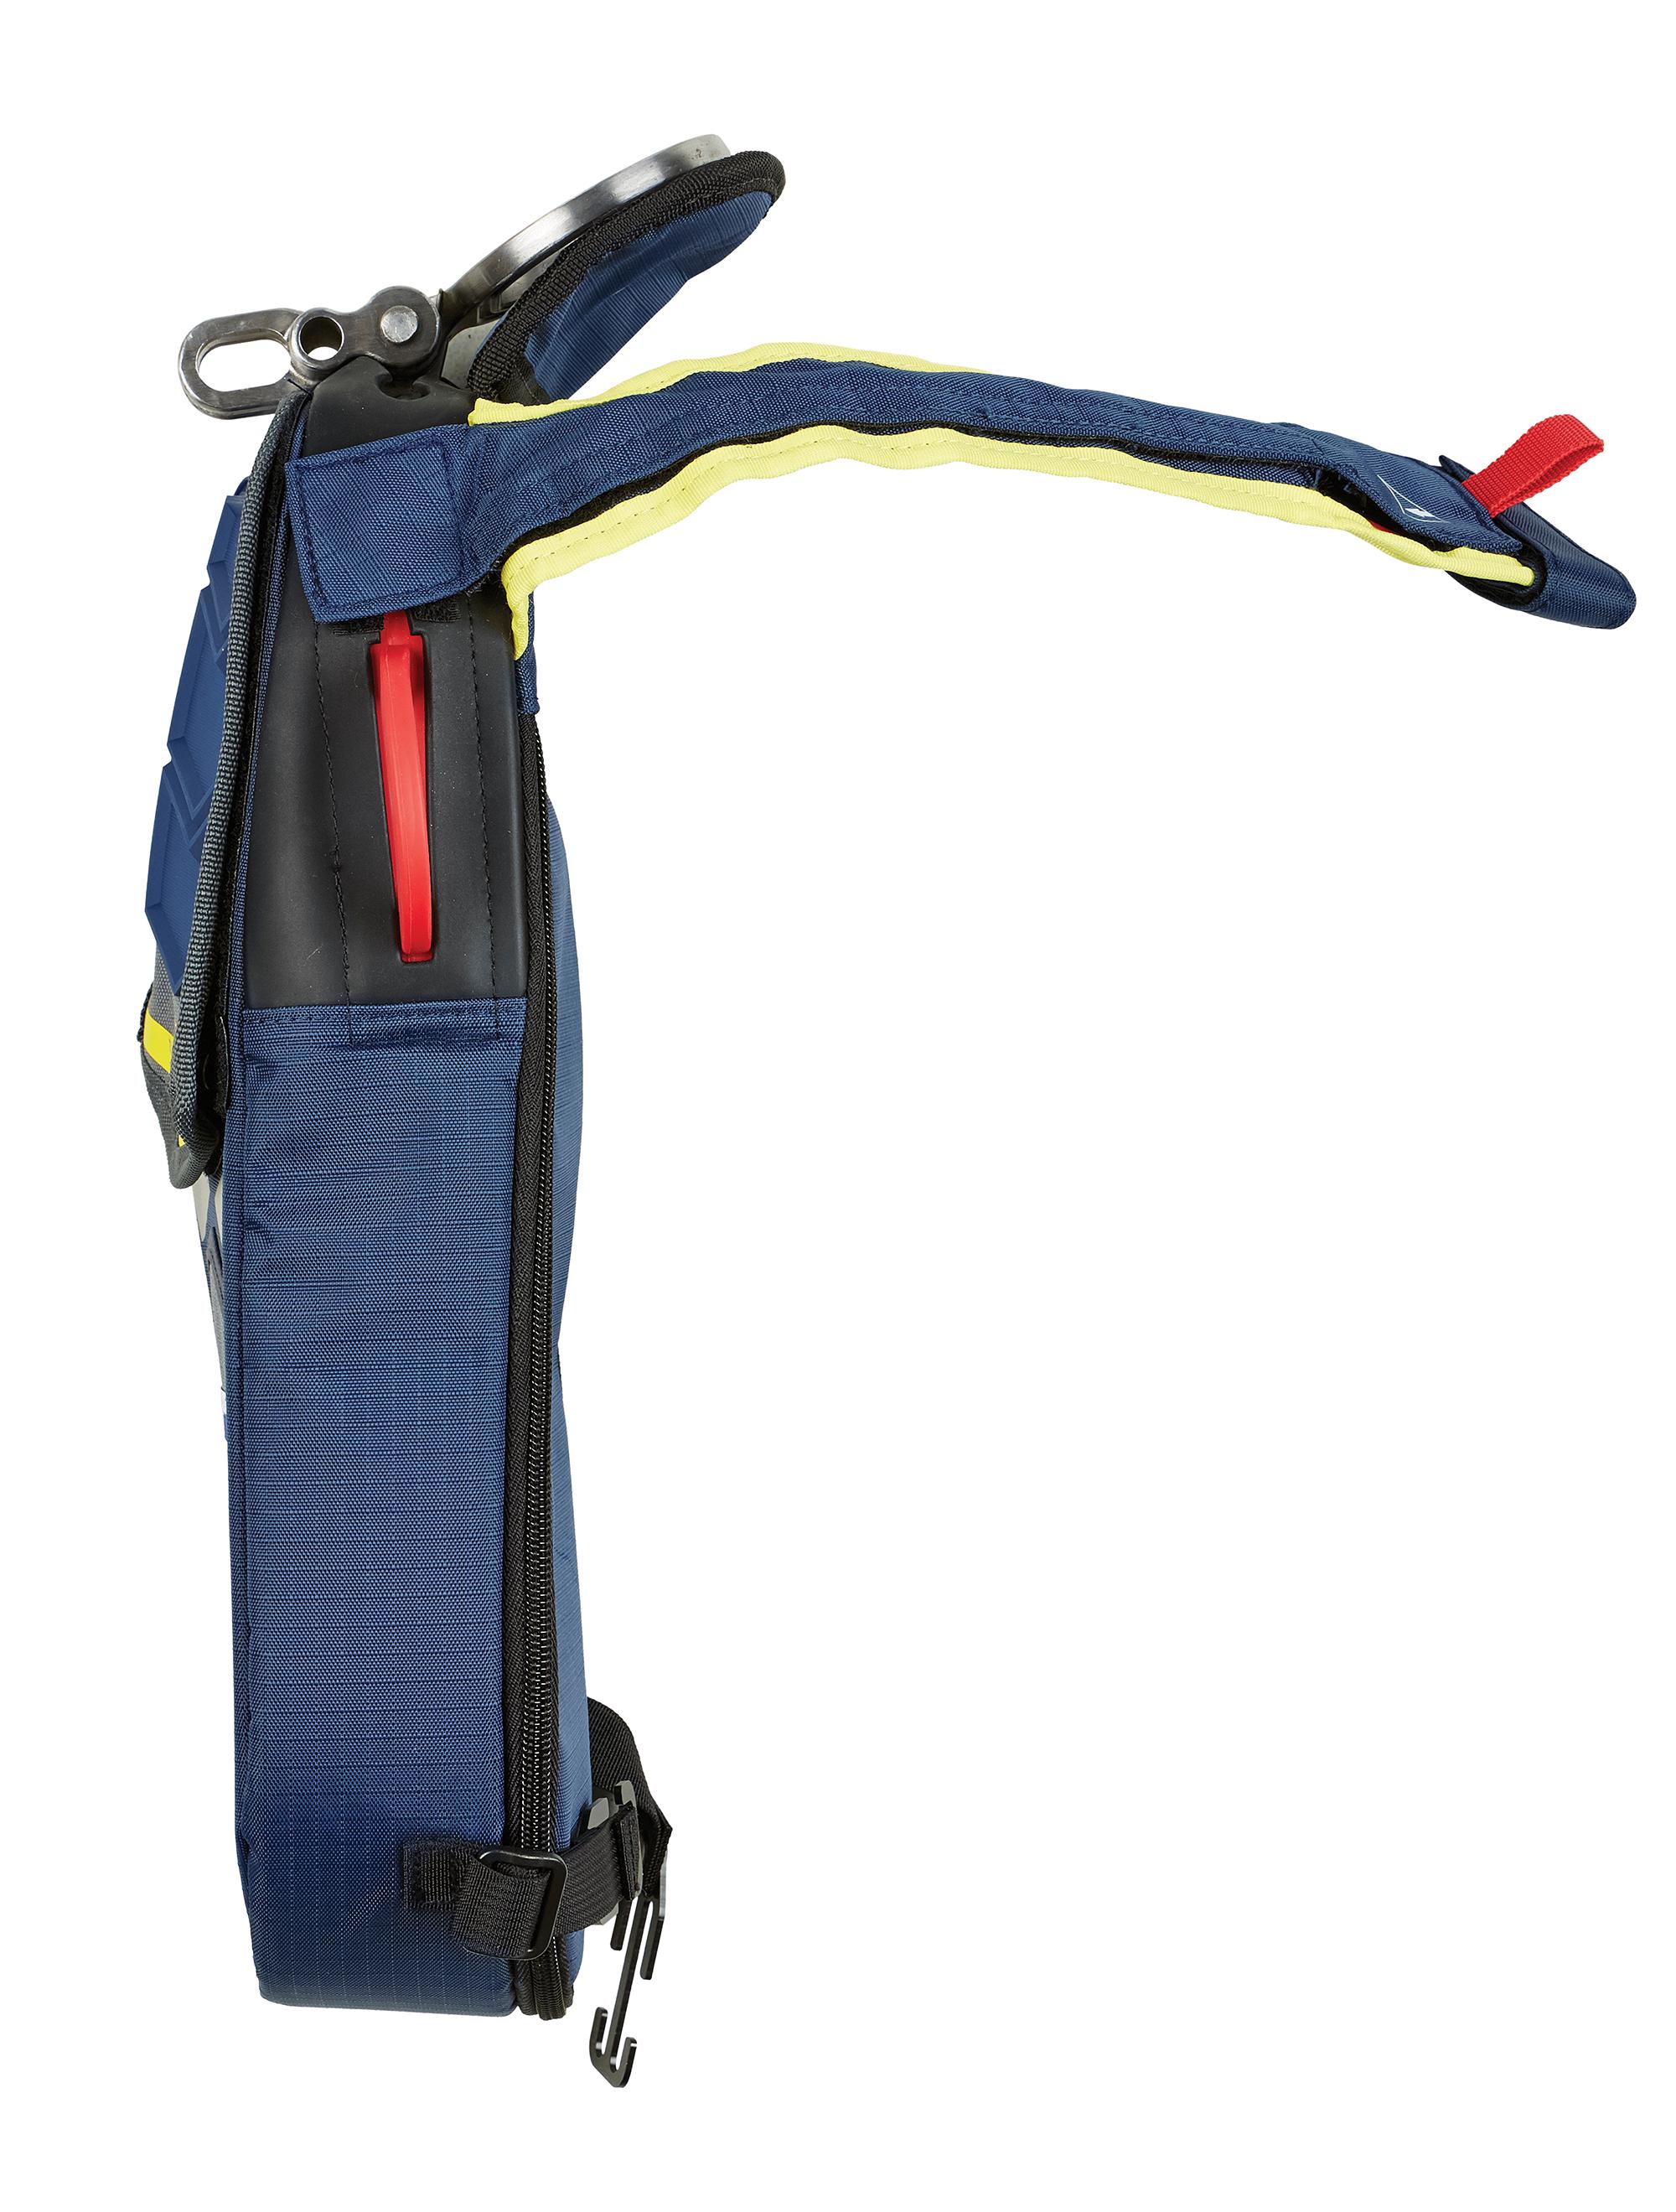 3M | DBI-SALA Self-Rescue Descent System